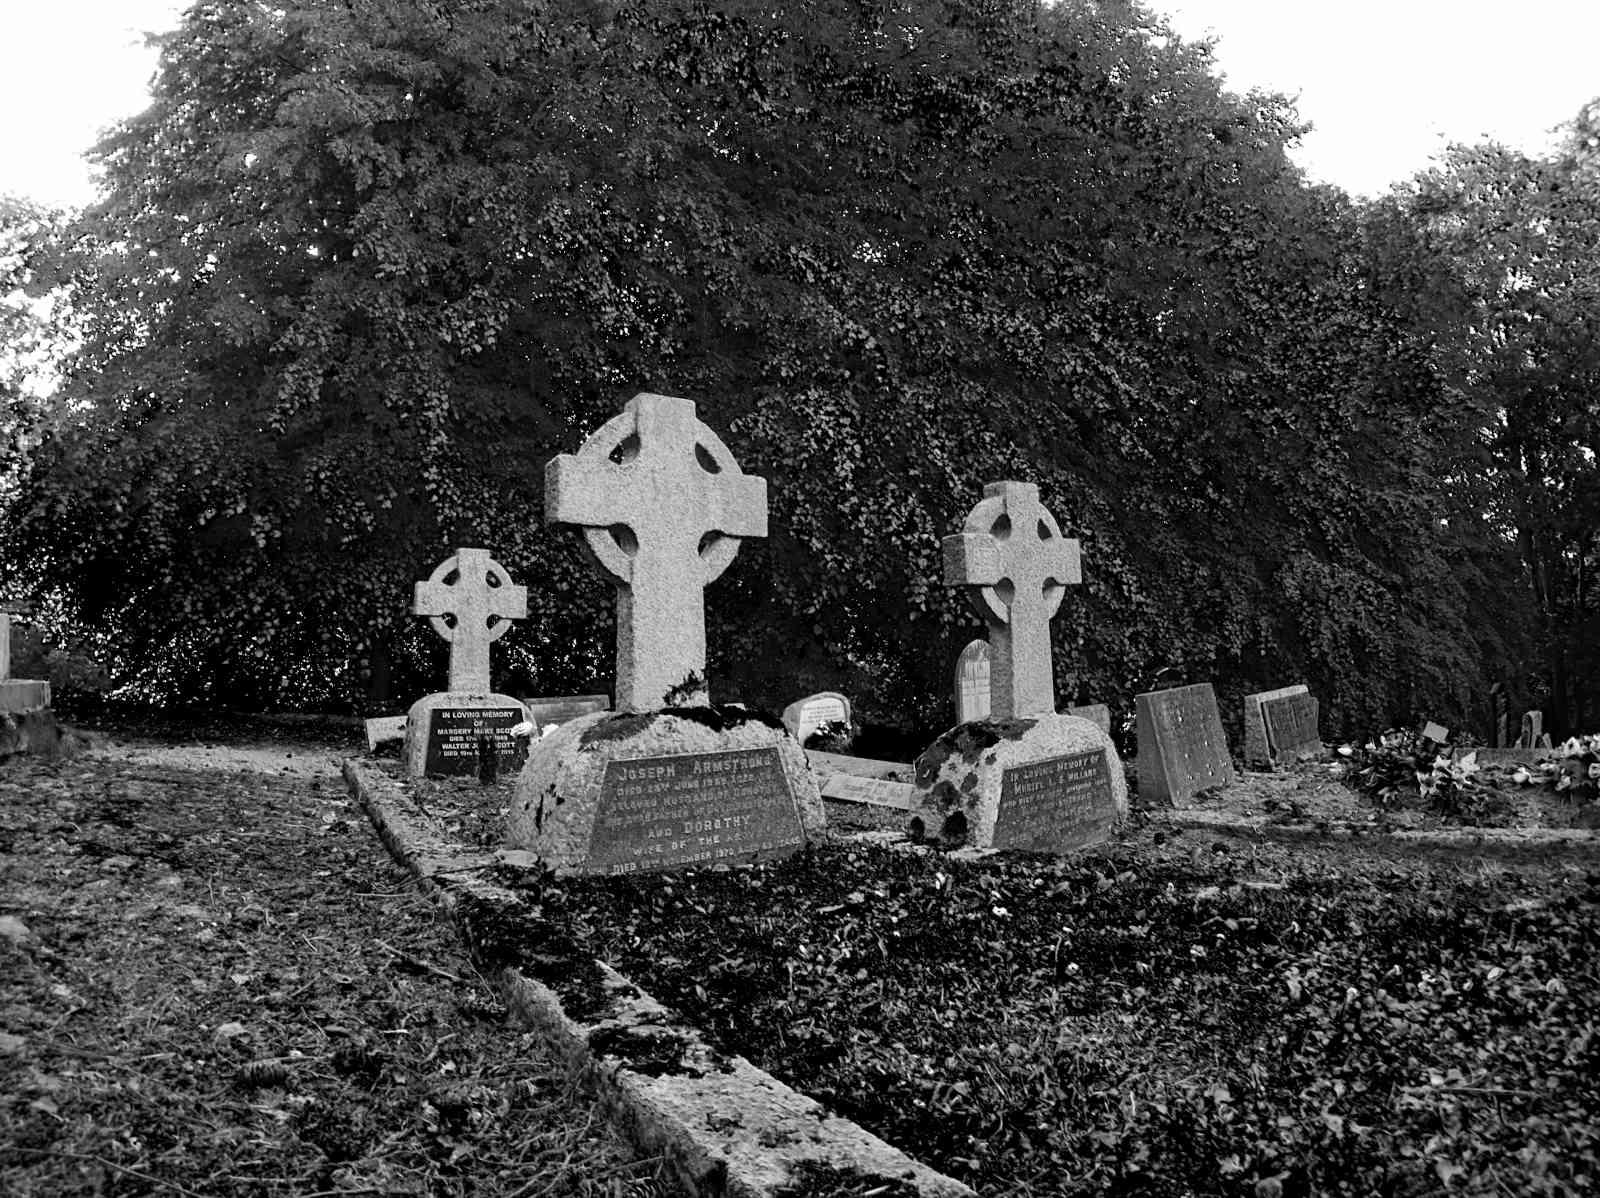 Friedhof Enniskerry 07, Olympus PEN E-PL7